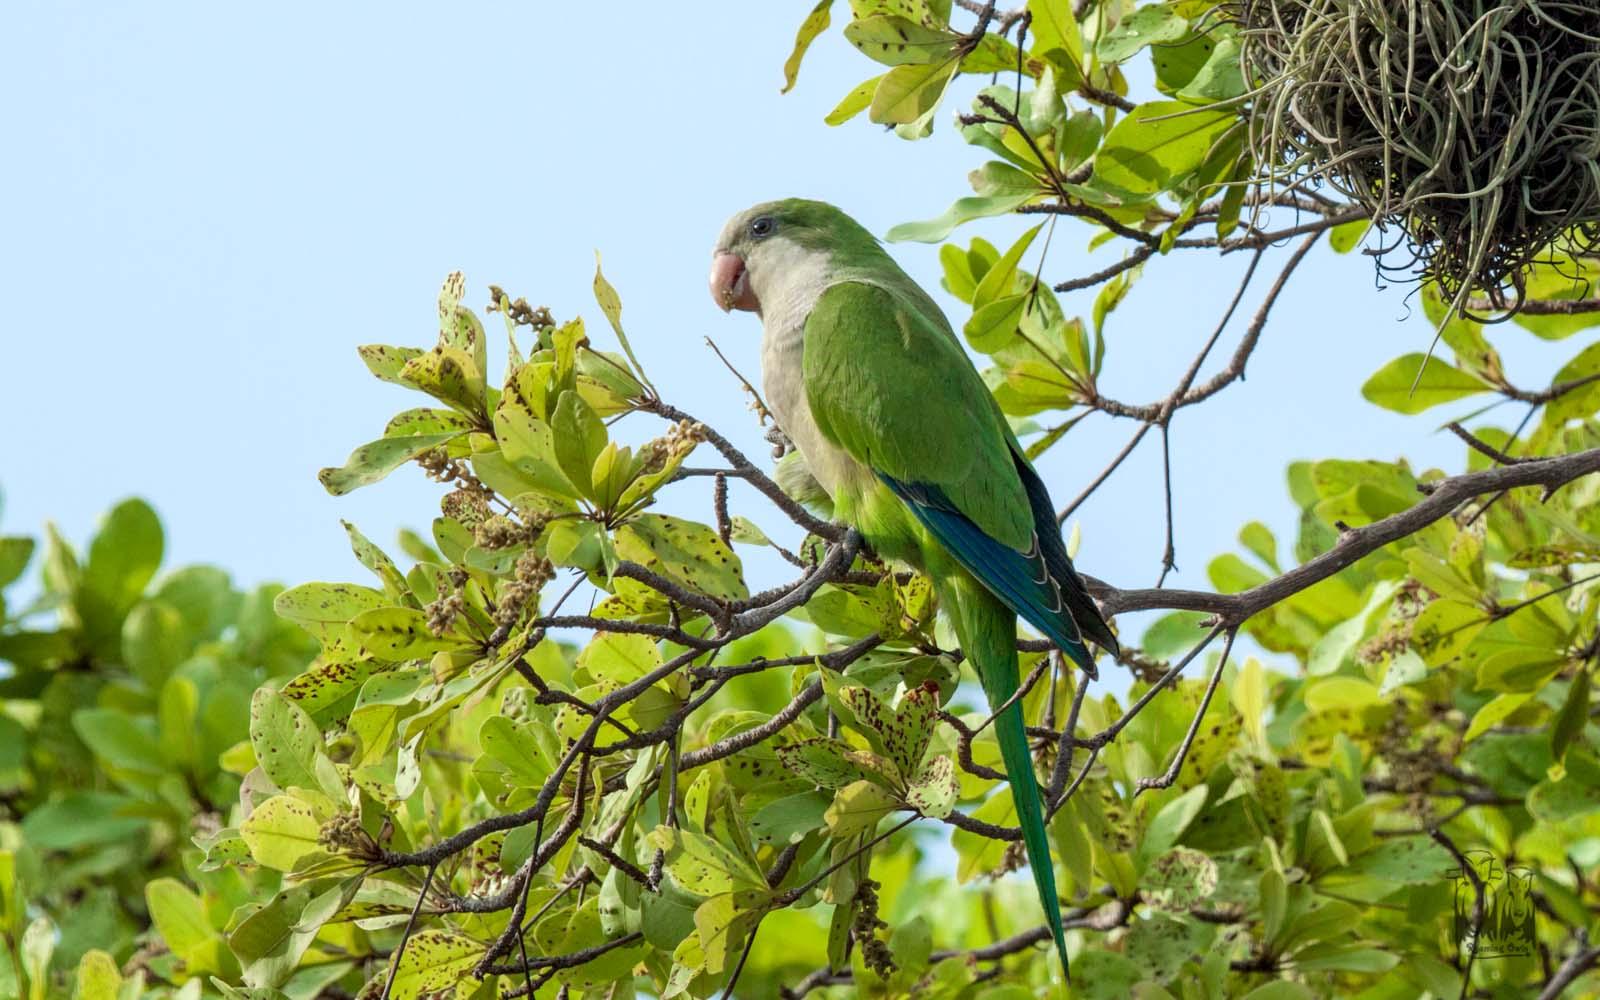 Monk parakeet sanjuan,Myiopsitta monachus,Quaker parrot,sanjuan birding